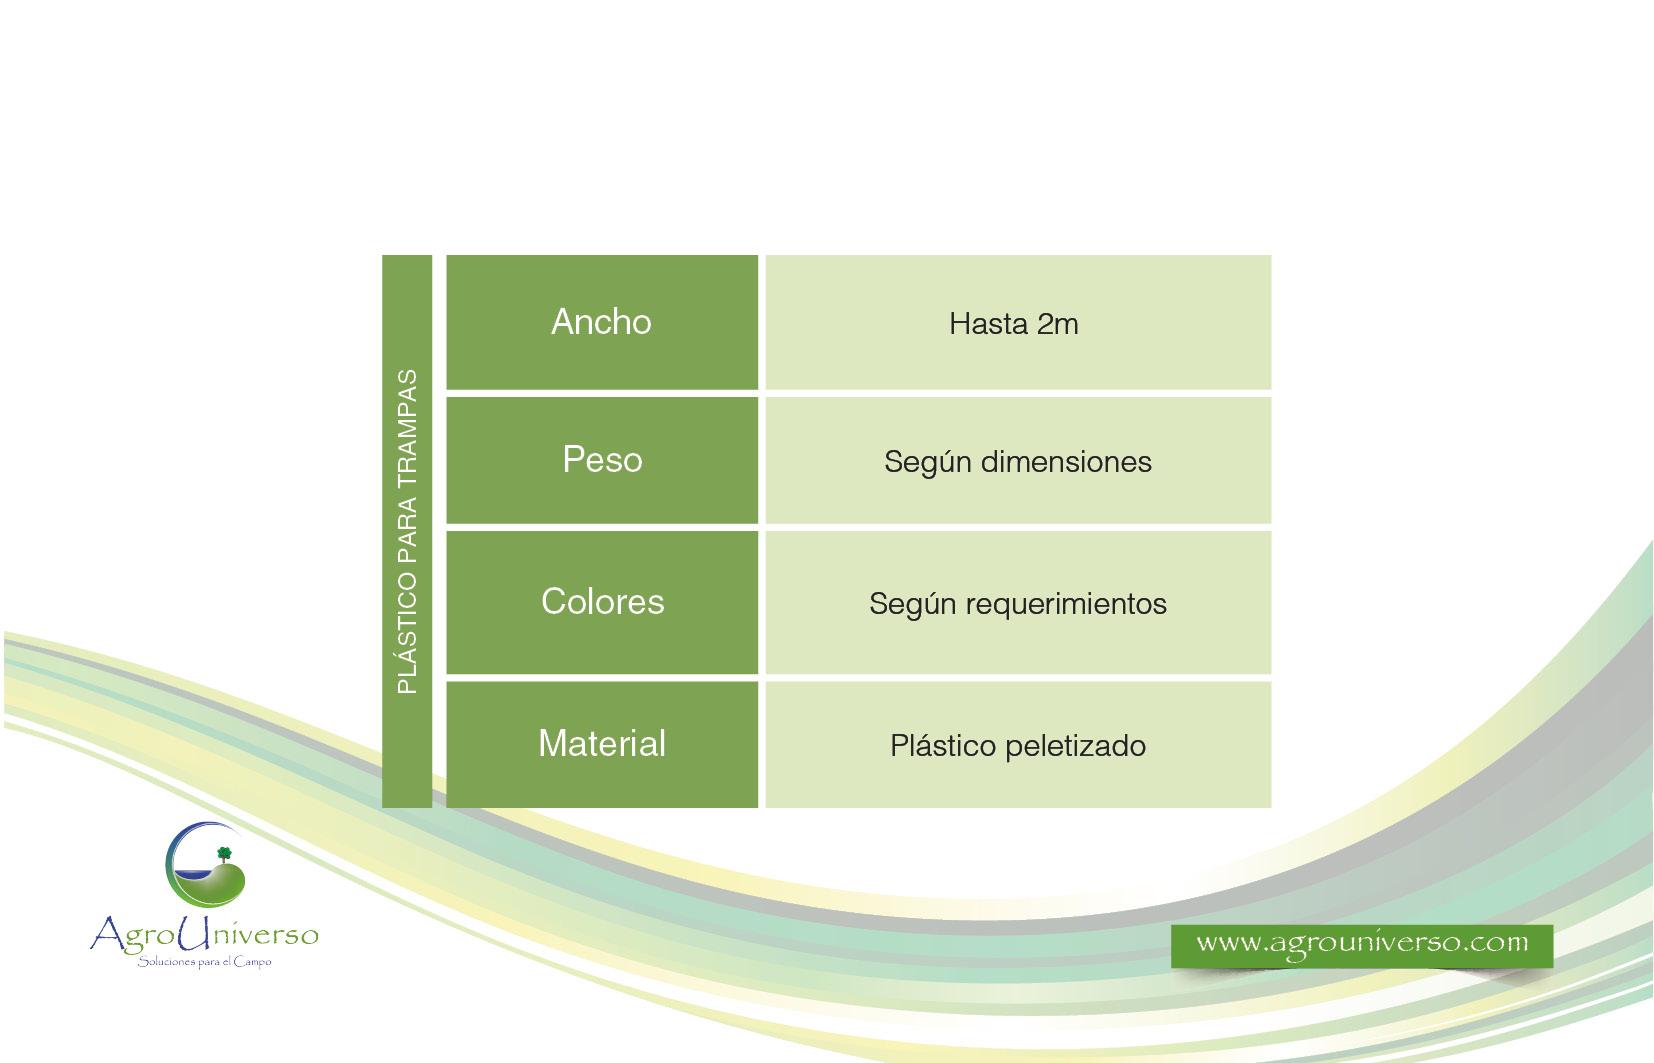 Catlogo-de-productos-Agrouniverso-23